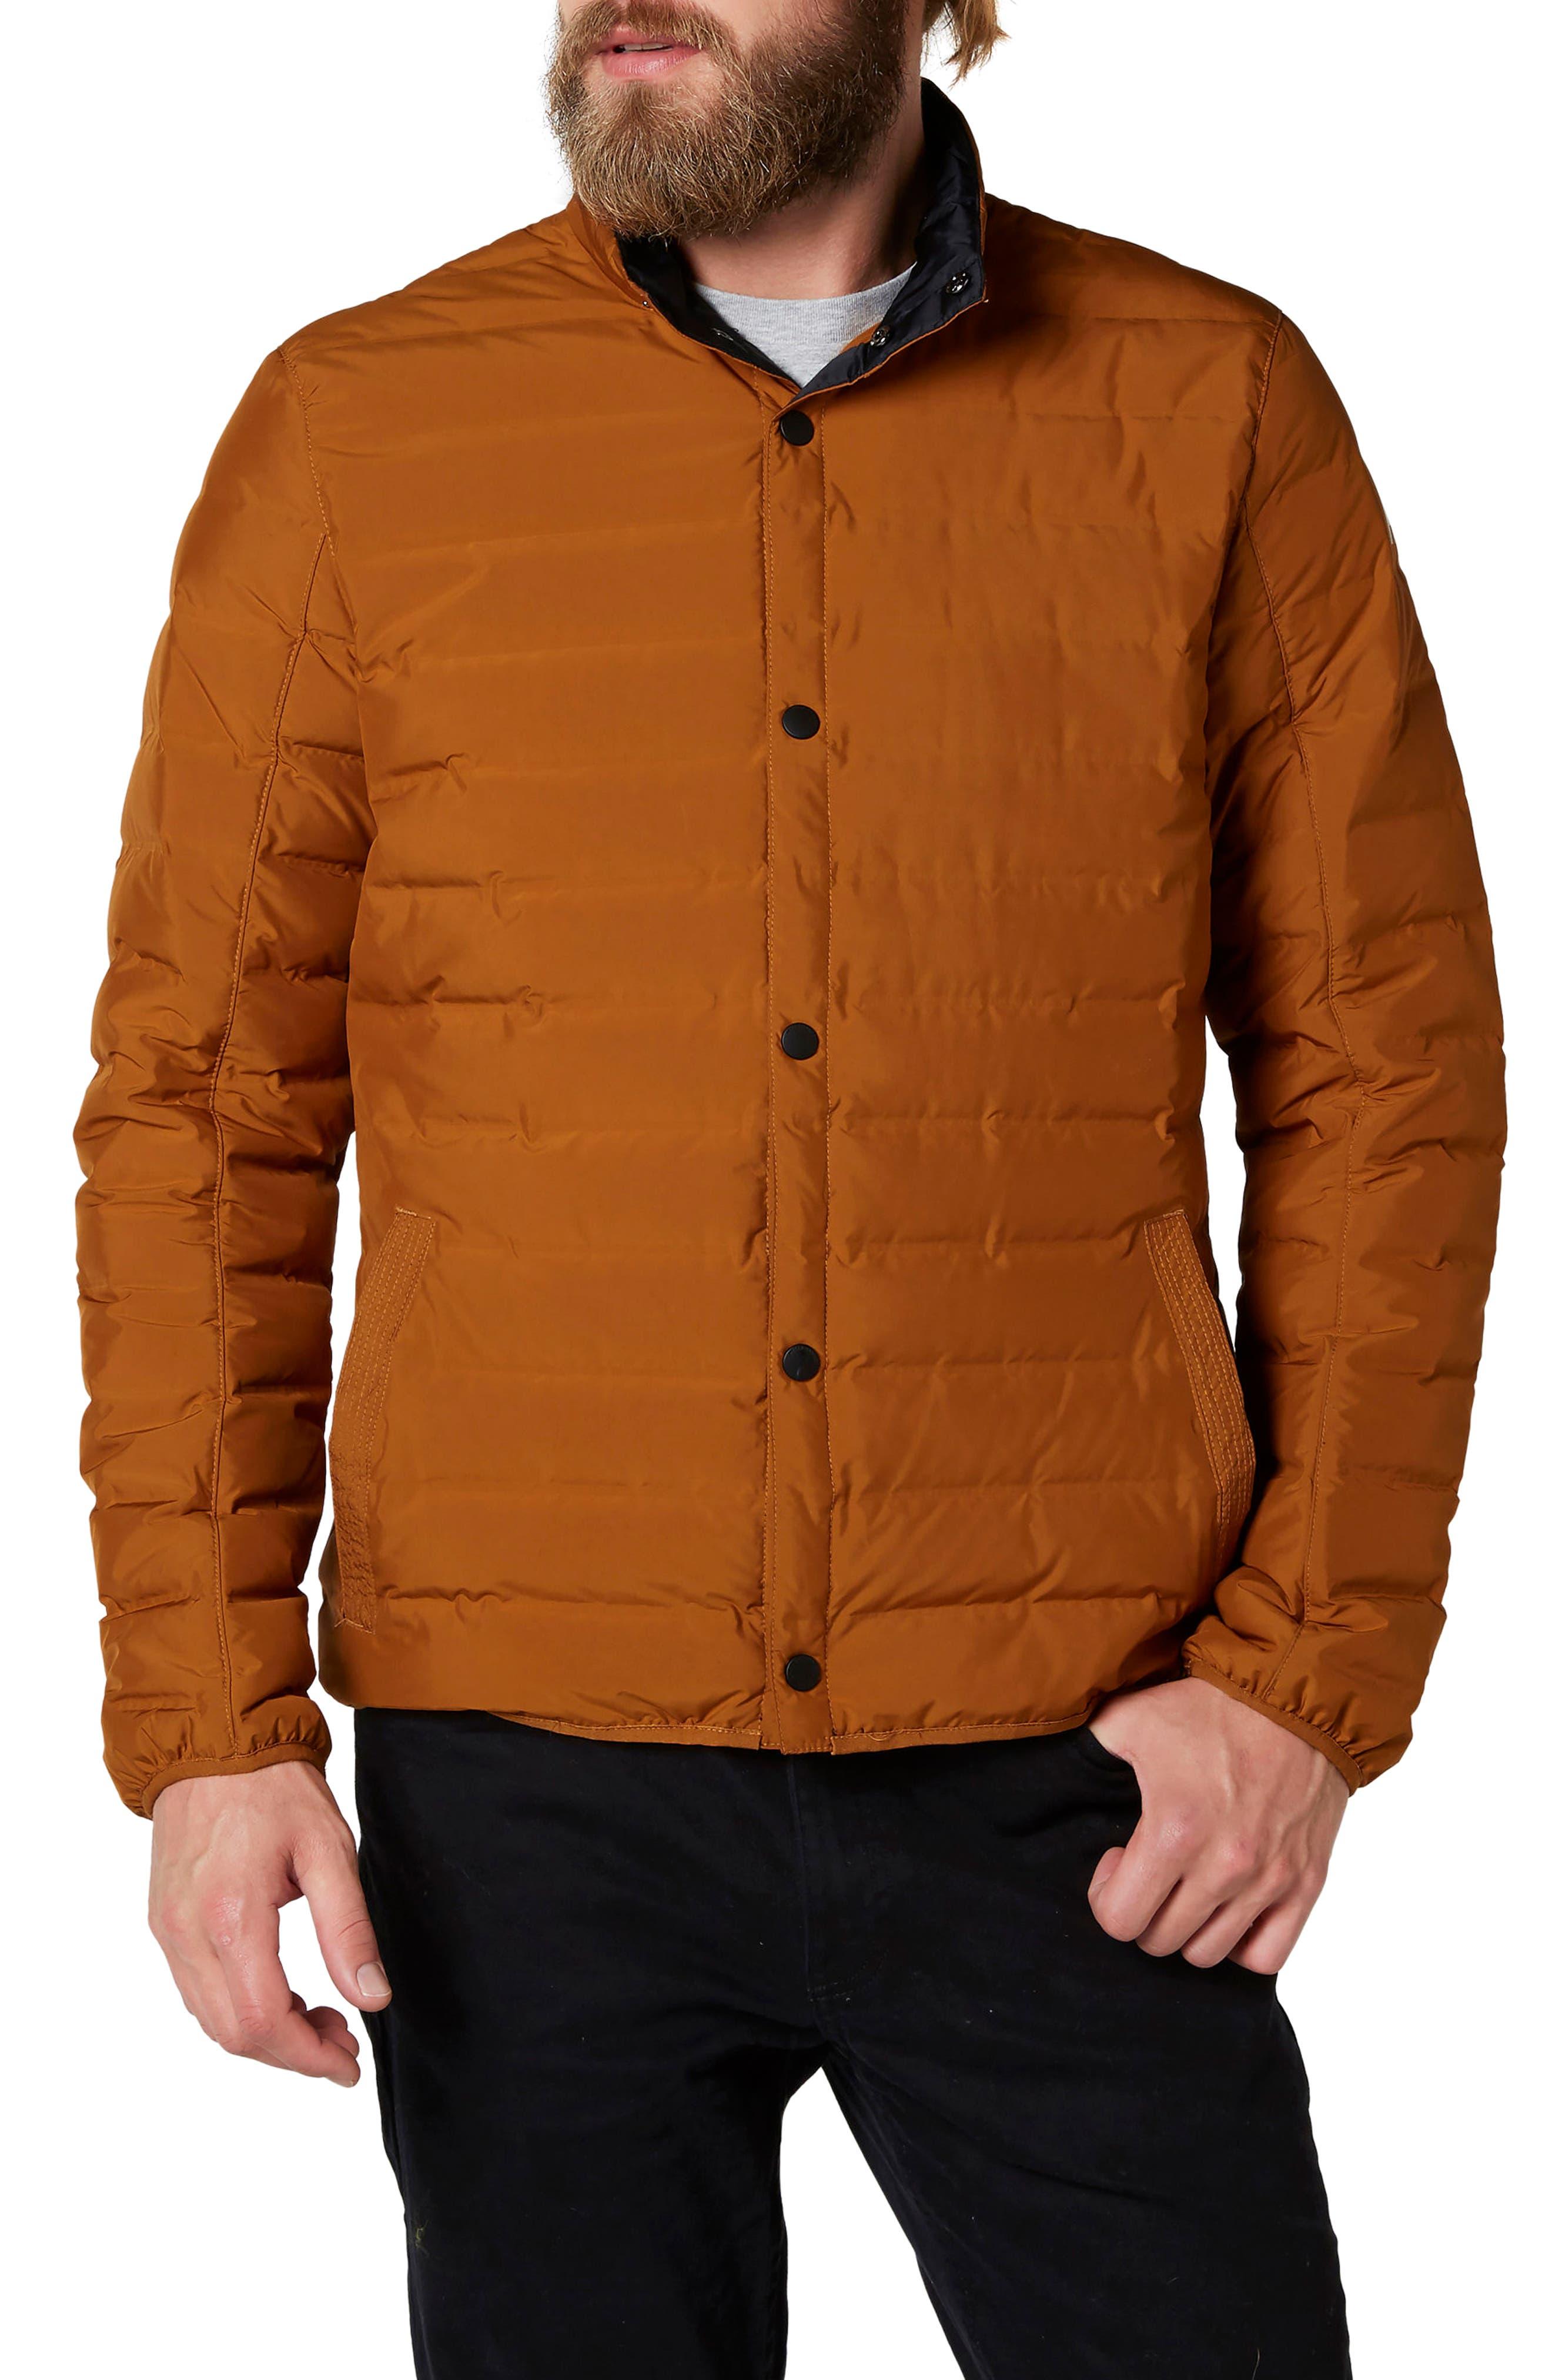 Main Image - Helly Hansen Urban Liner Jacket